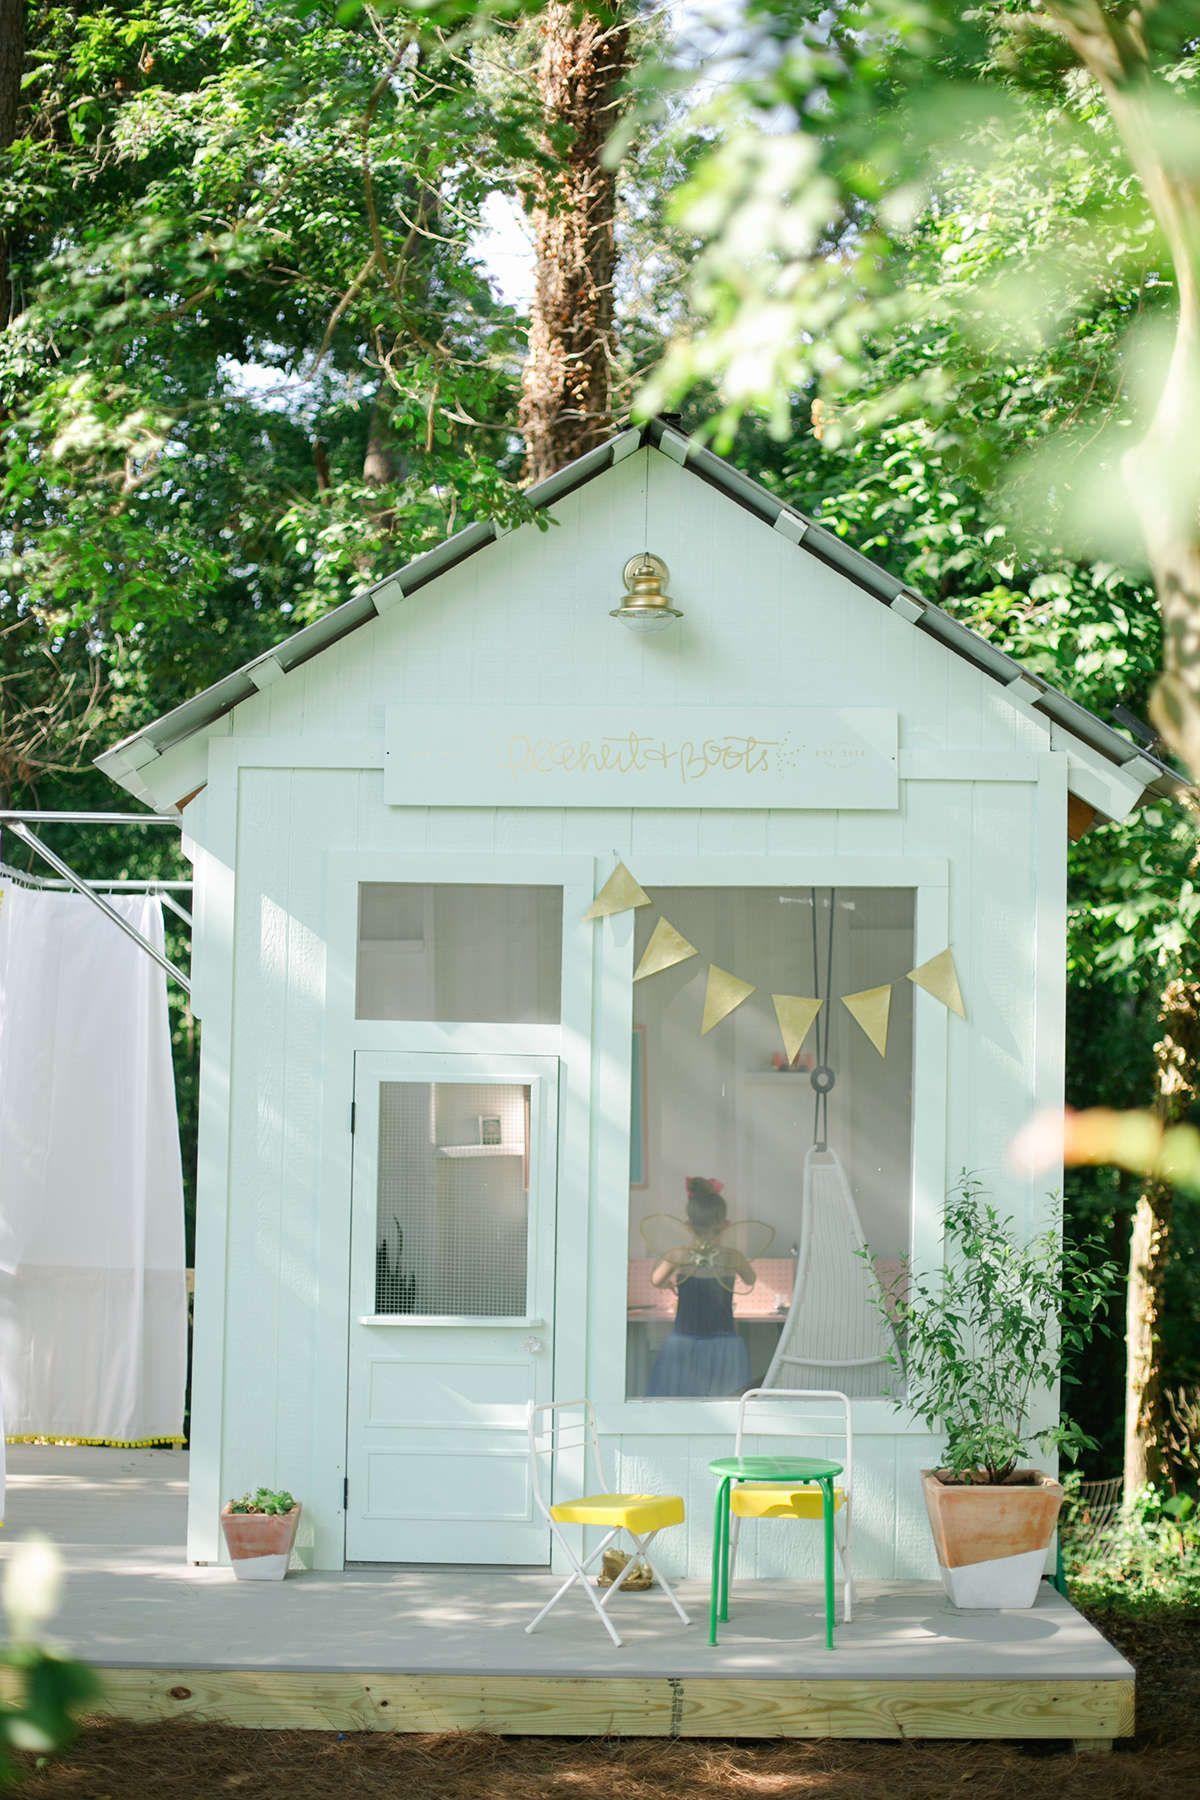 playhouse plans | Playhouses, Diy playhouse and Play houses